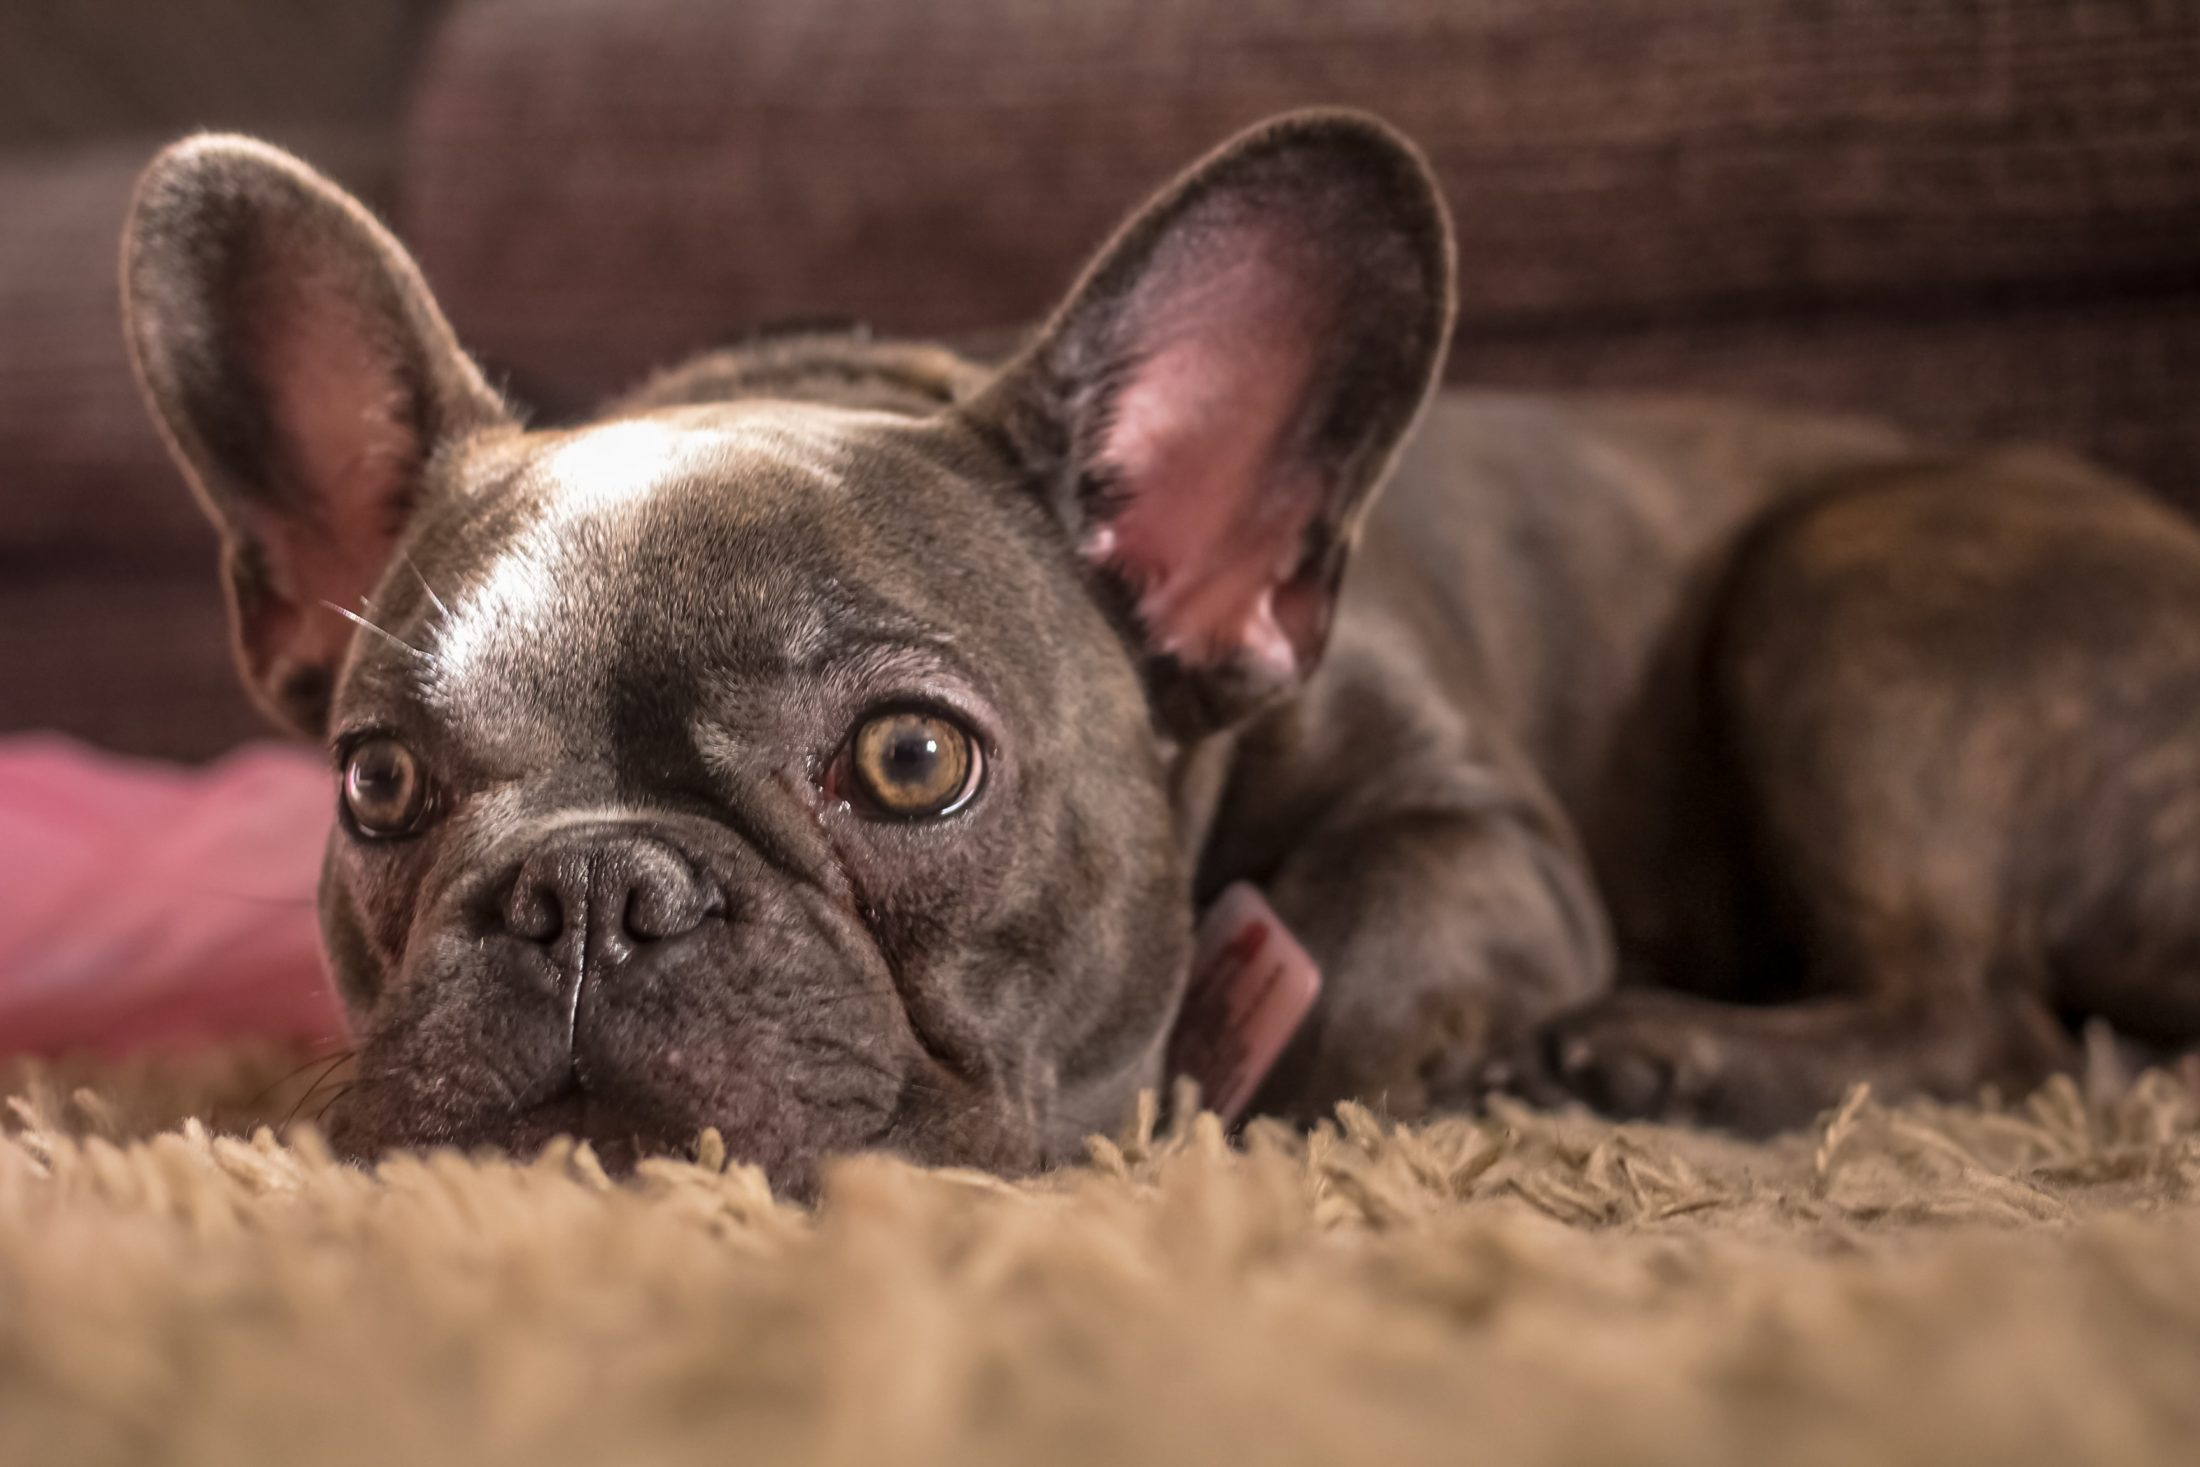 buldogue francês cinza deitado no tapete